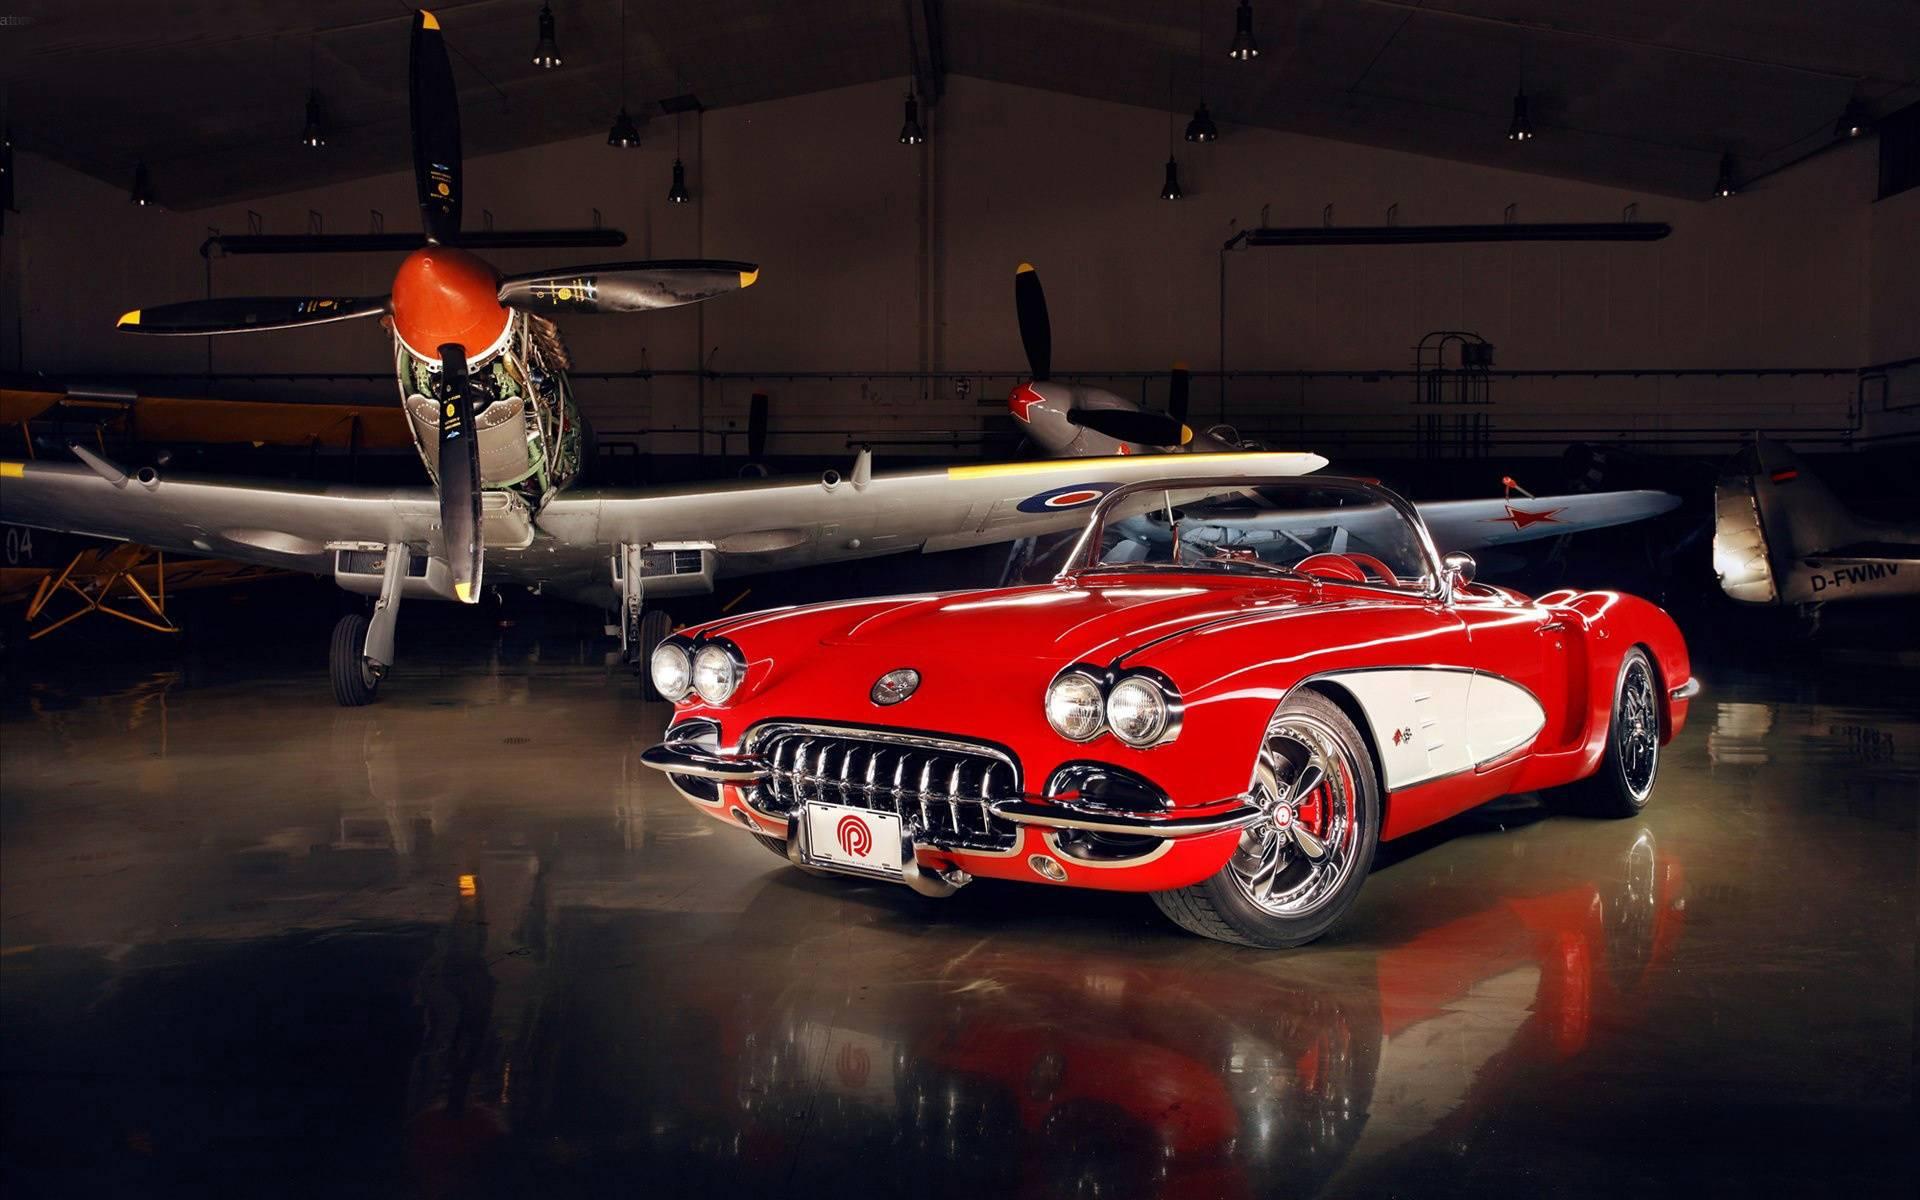 http://4.bp.blogspot.com/-FOoneeLPkDE/TzjK8hiC5eI/AAAAAAAAHrw/IsPICByjluc/s1920/chevrolet-corvette-1959-wallpaper.jpg